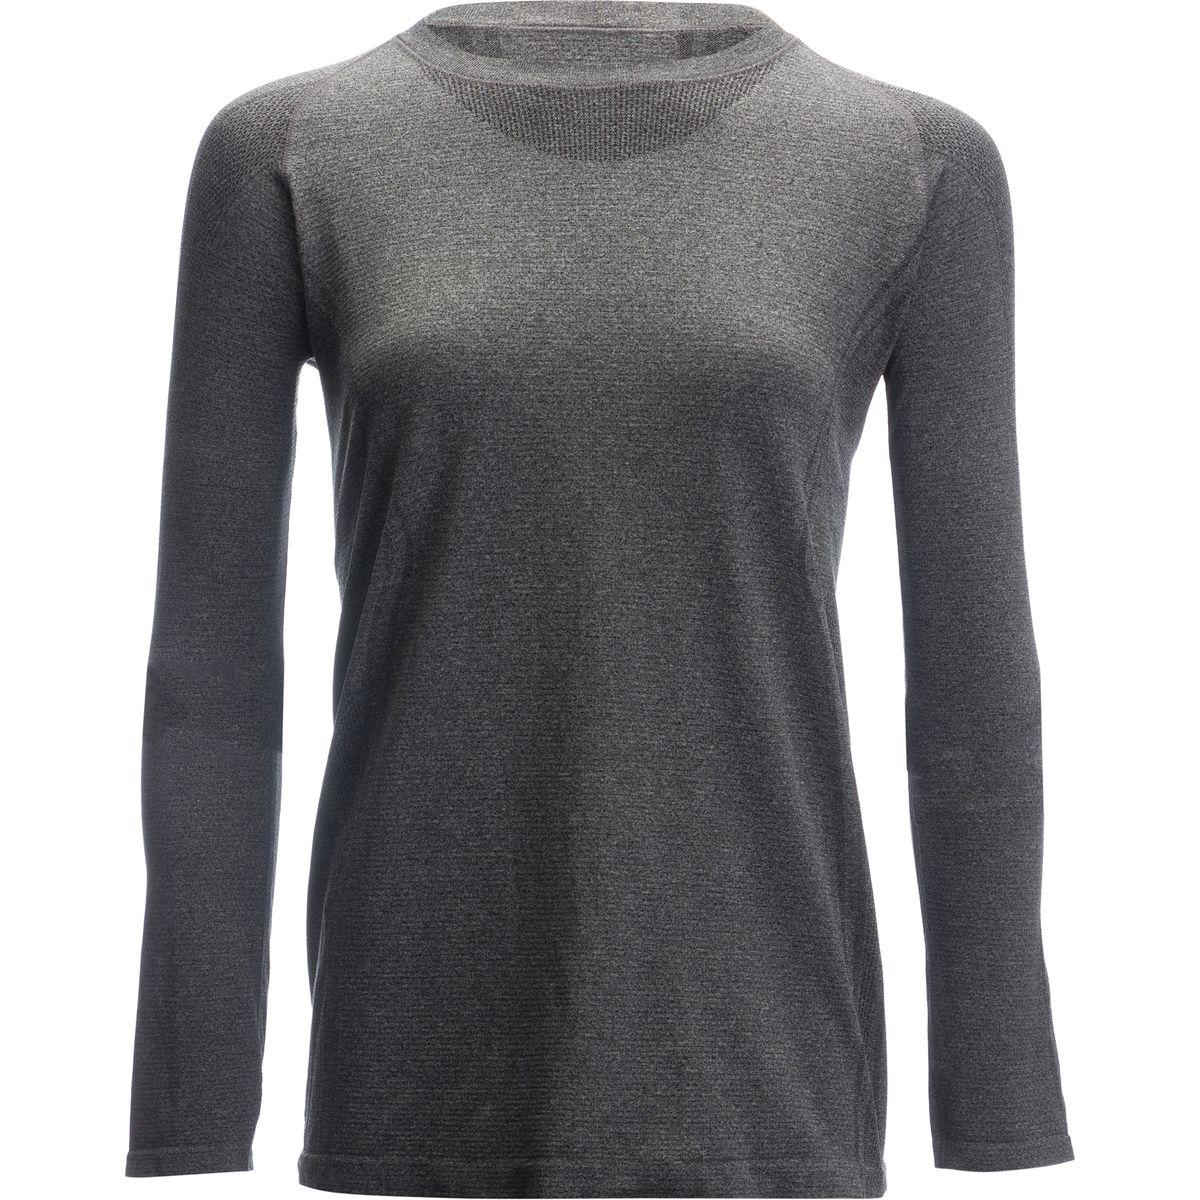 Nux Unity Shirt - Women